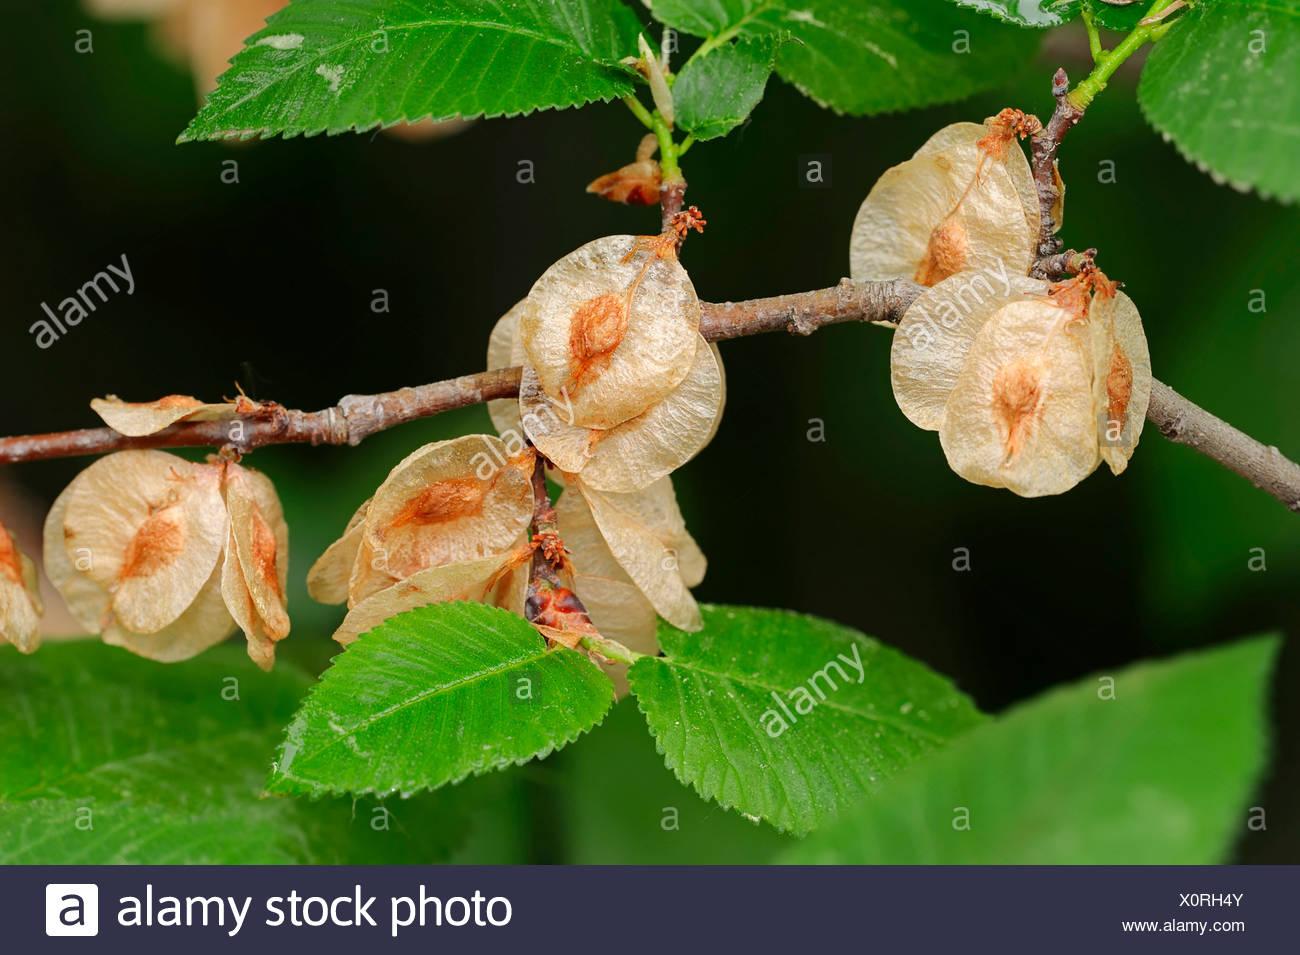 European White Elm or Fluttering Elm (Ulmus laevis), branch with fruit, Provence, southern France, France - Stock Image